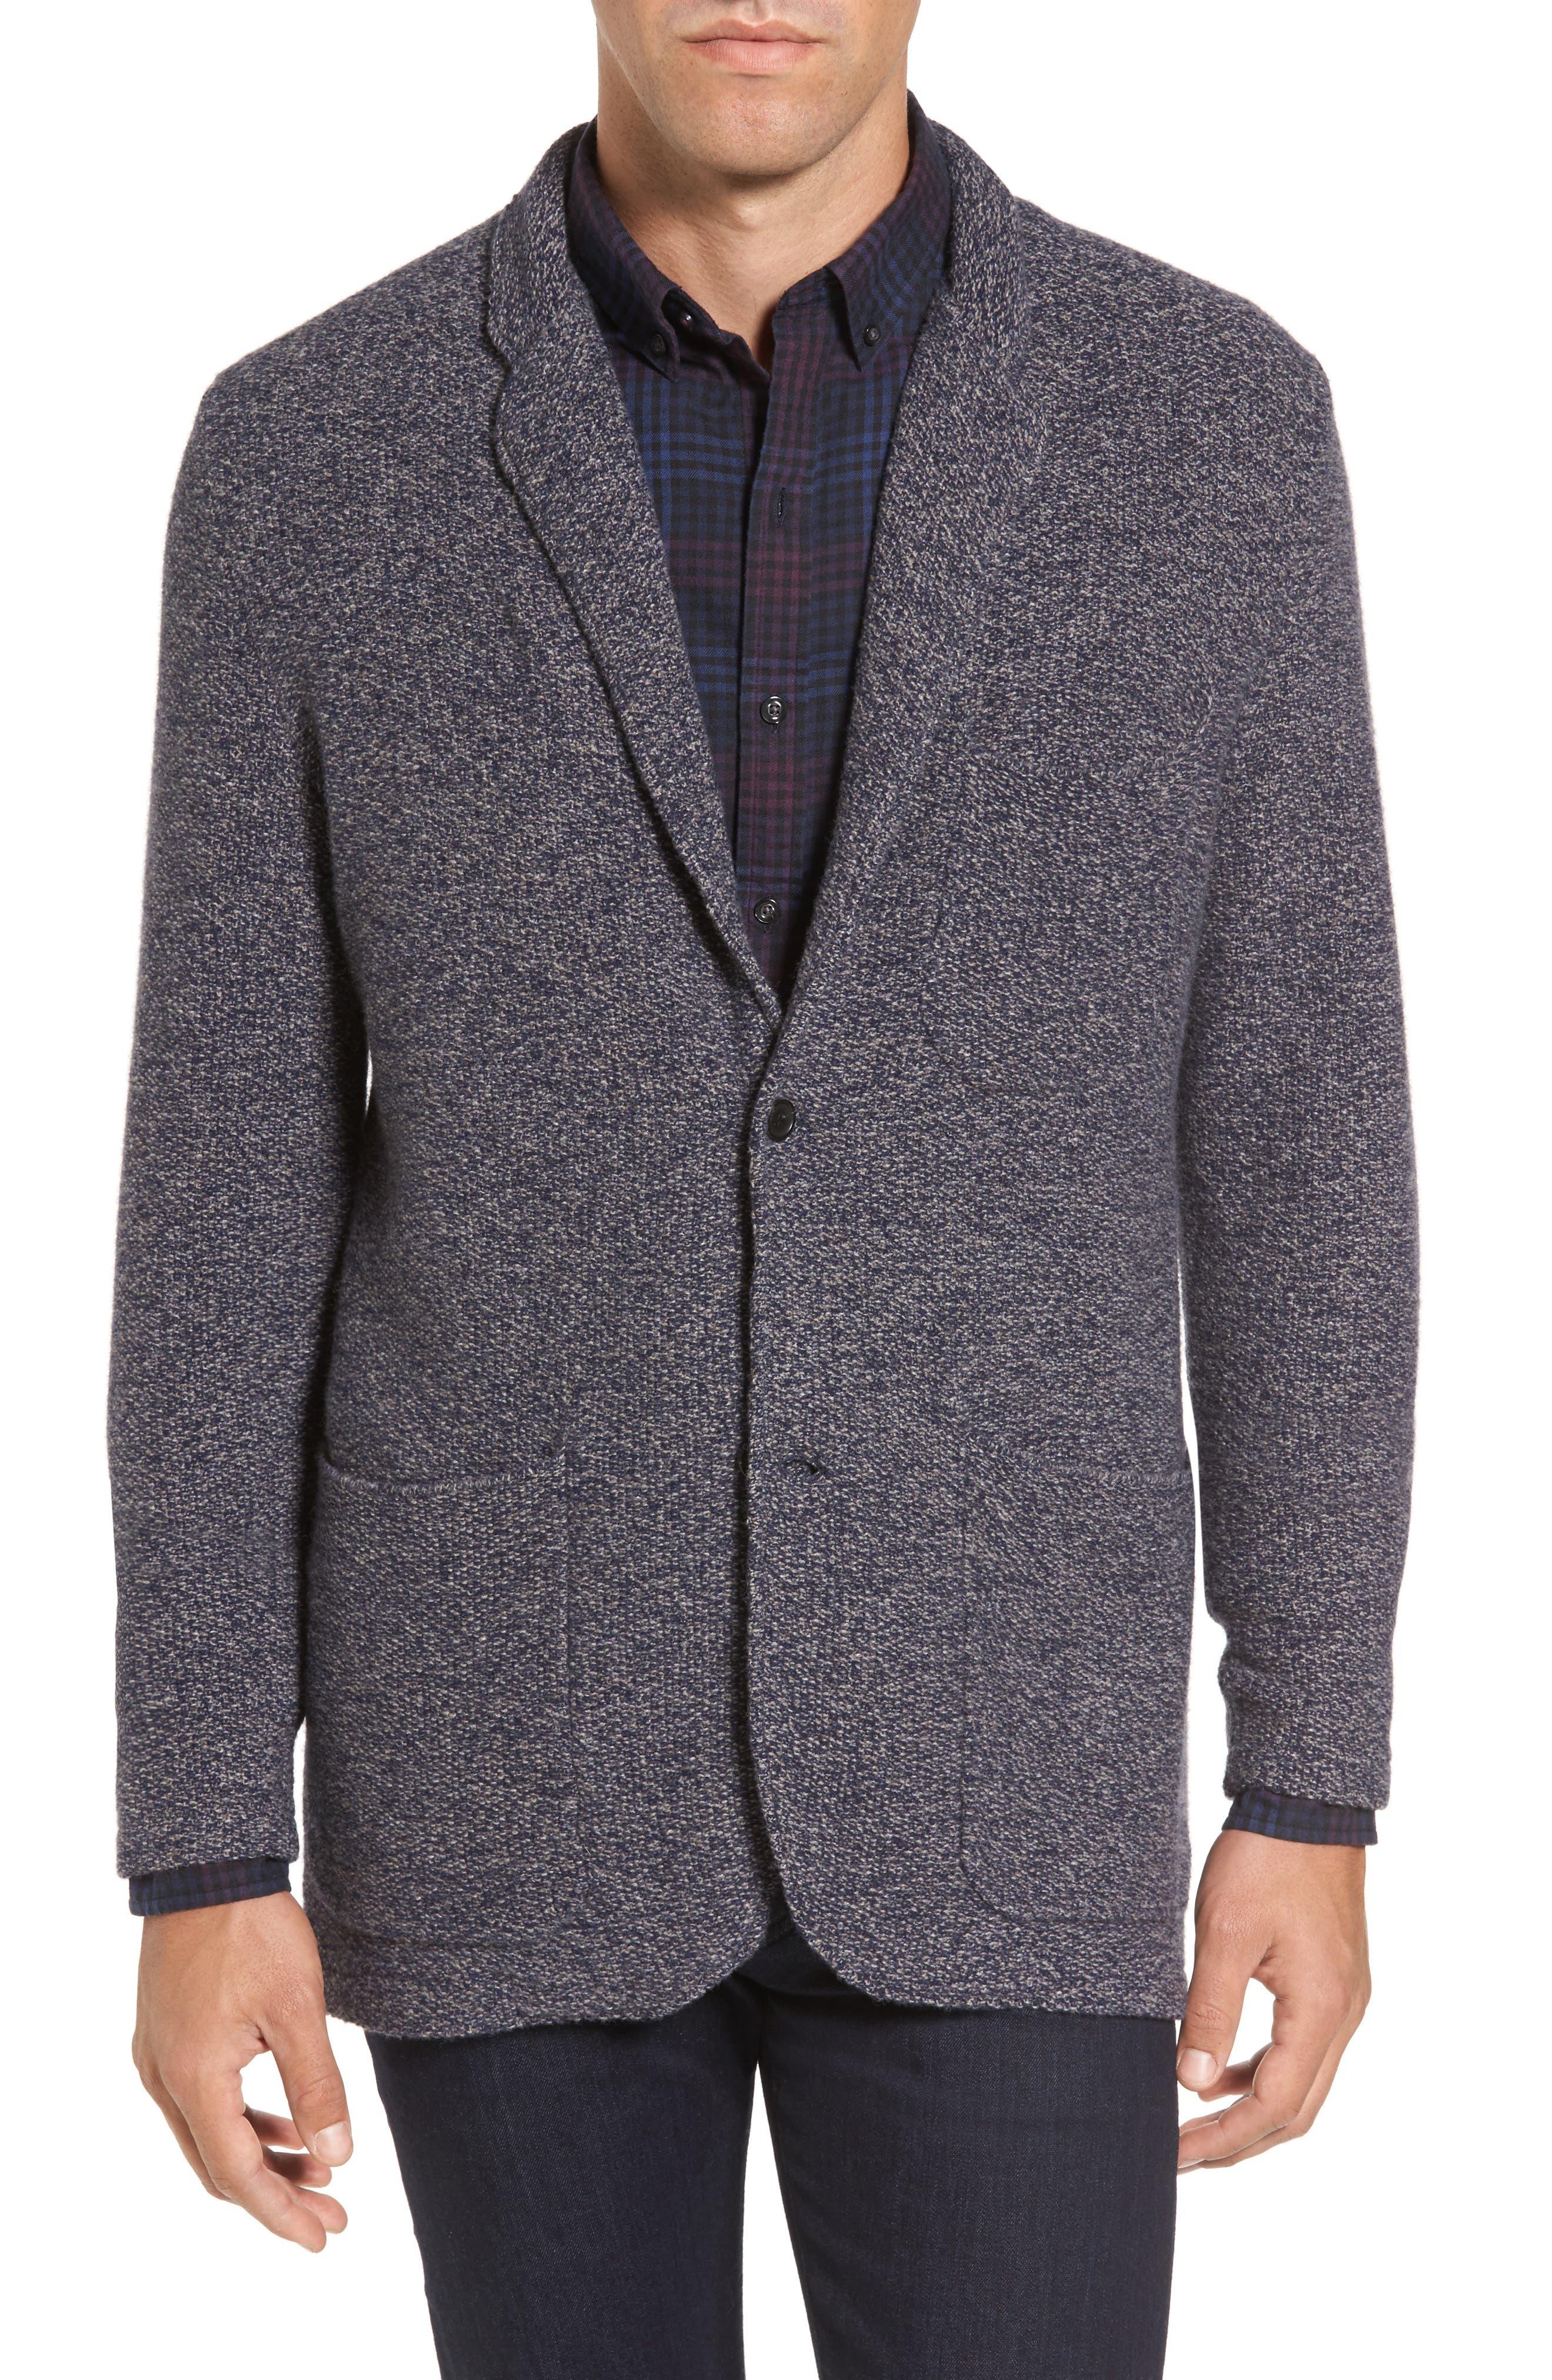 Michael Bastian Deconstructed Merino & Yak Wool Sweater Jacket